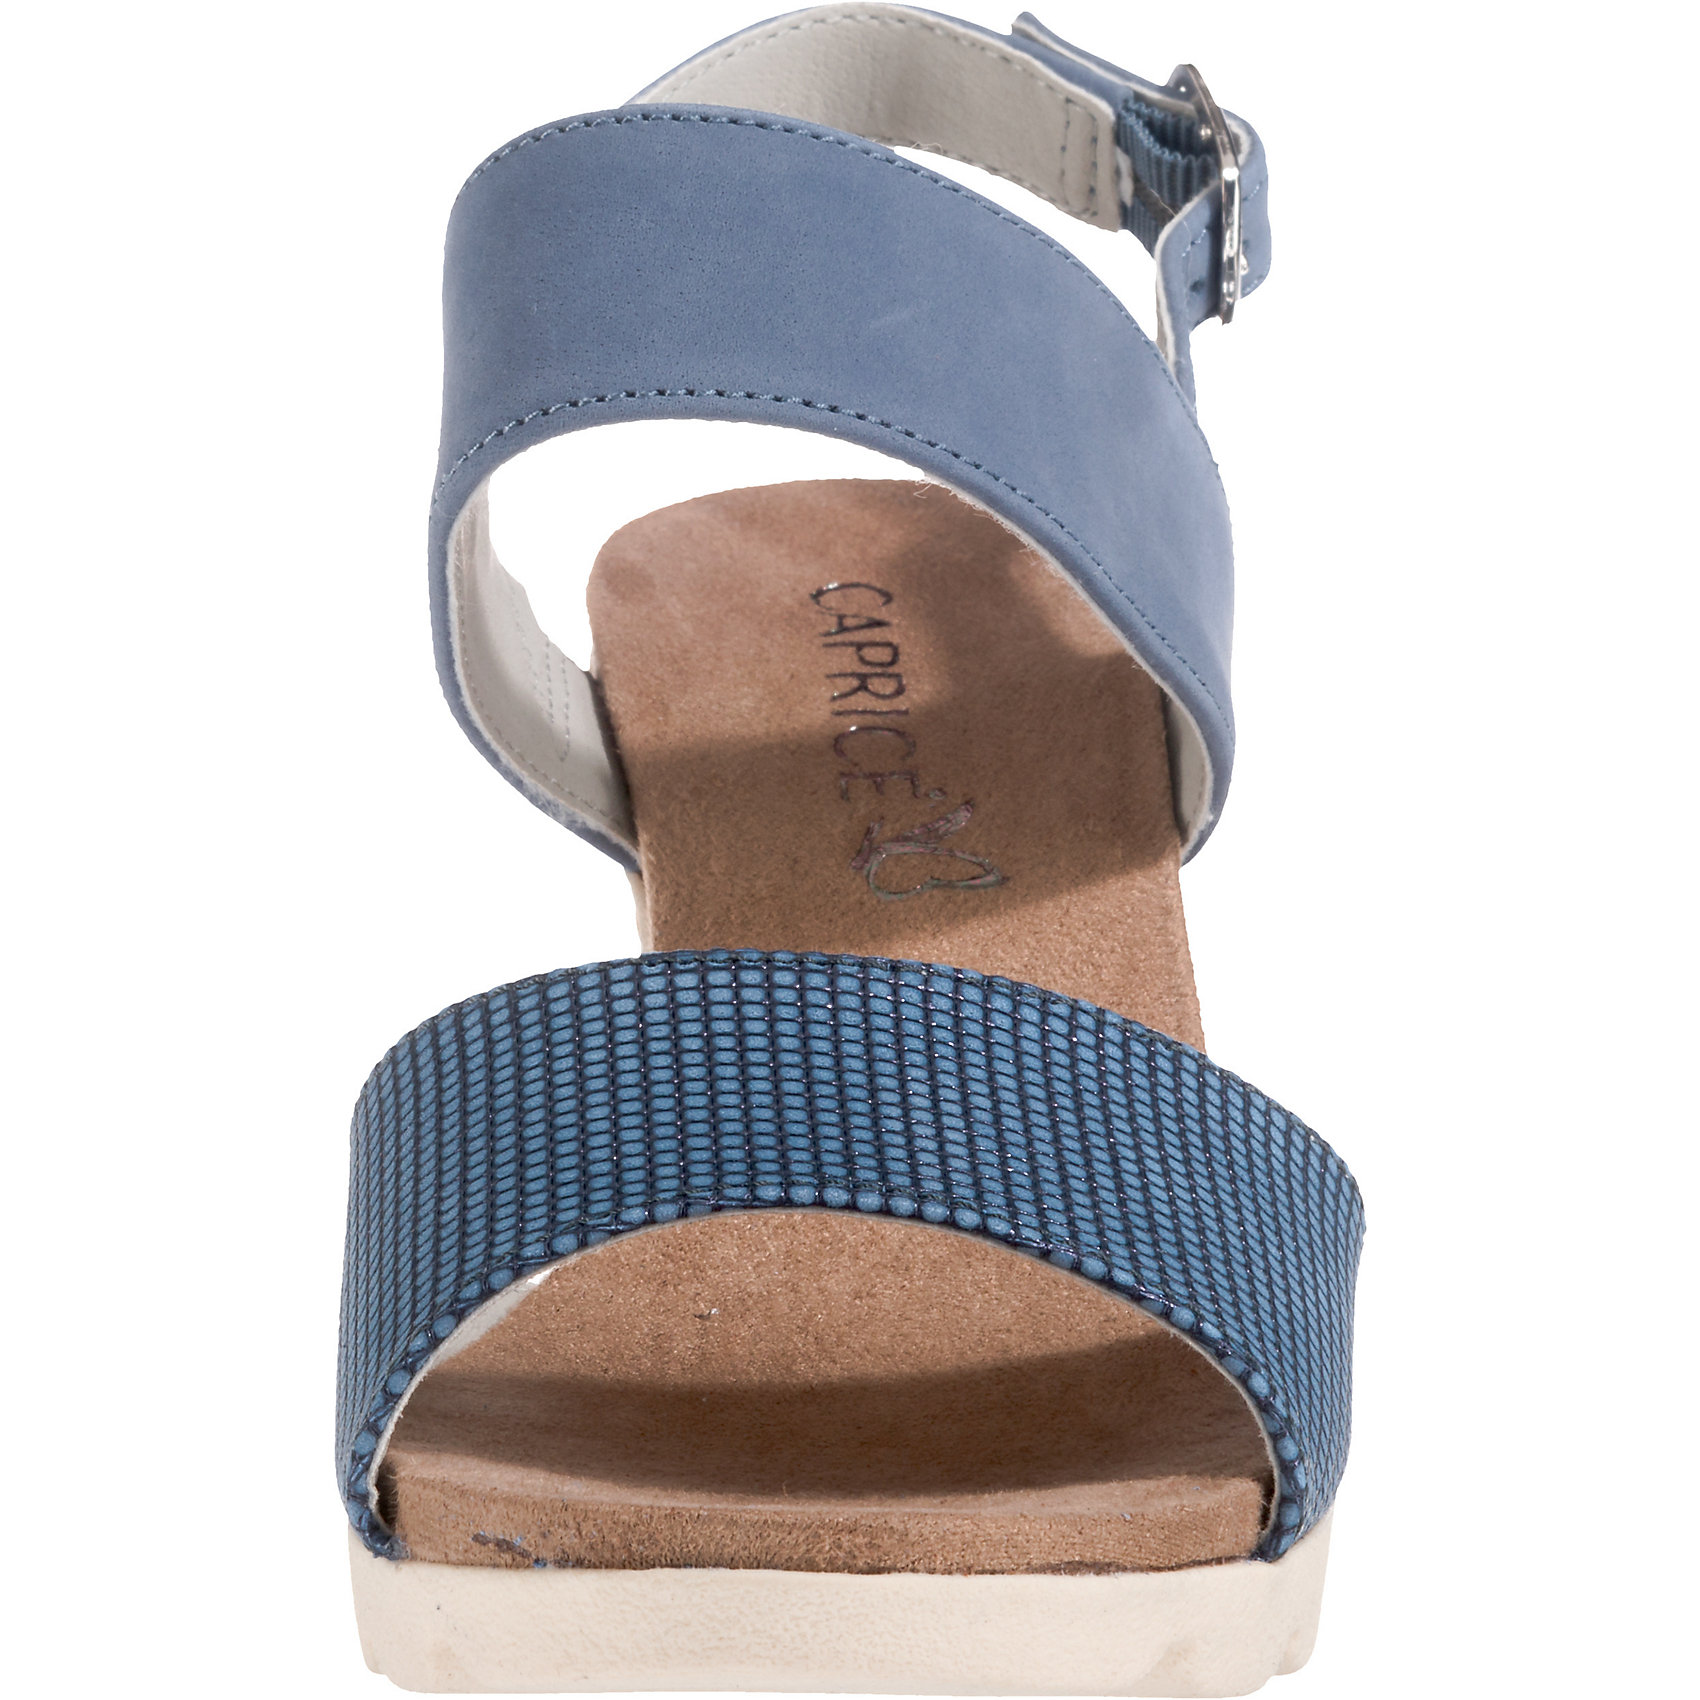 Neu CAPRICE KeilSandaleeetten 7558553 für Damen blau-kombi